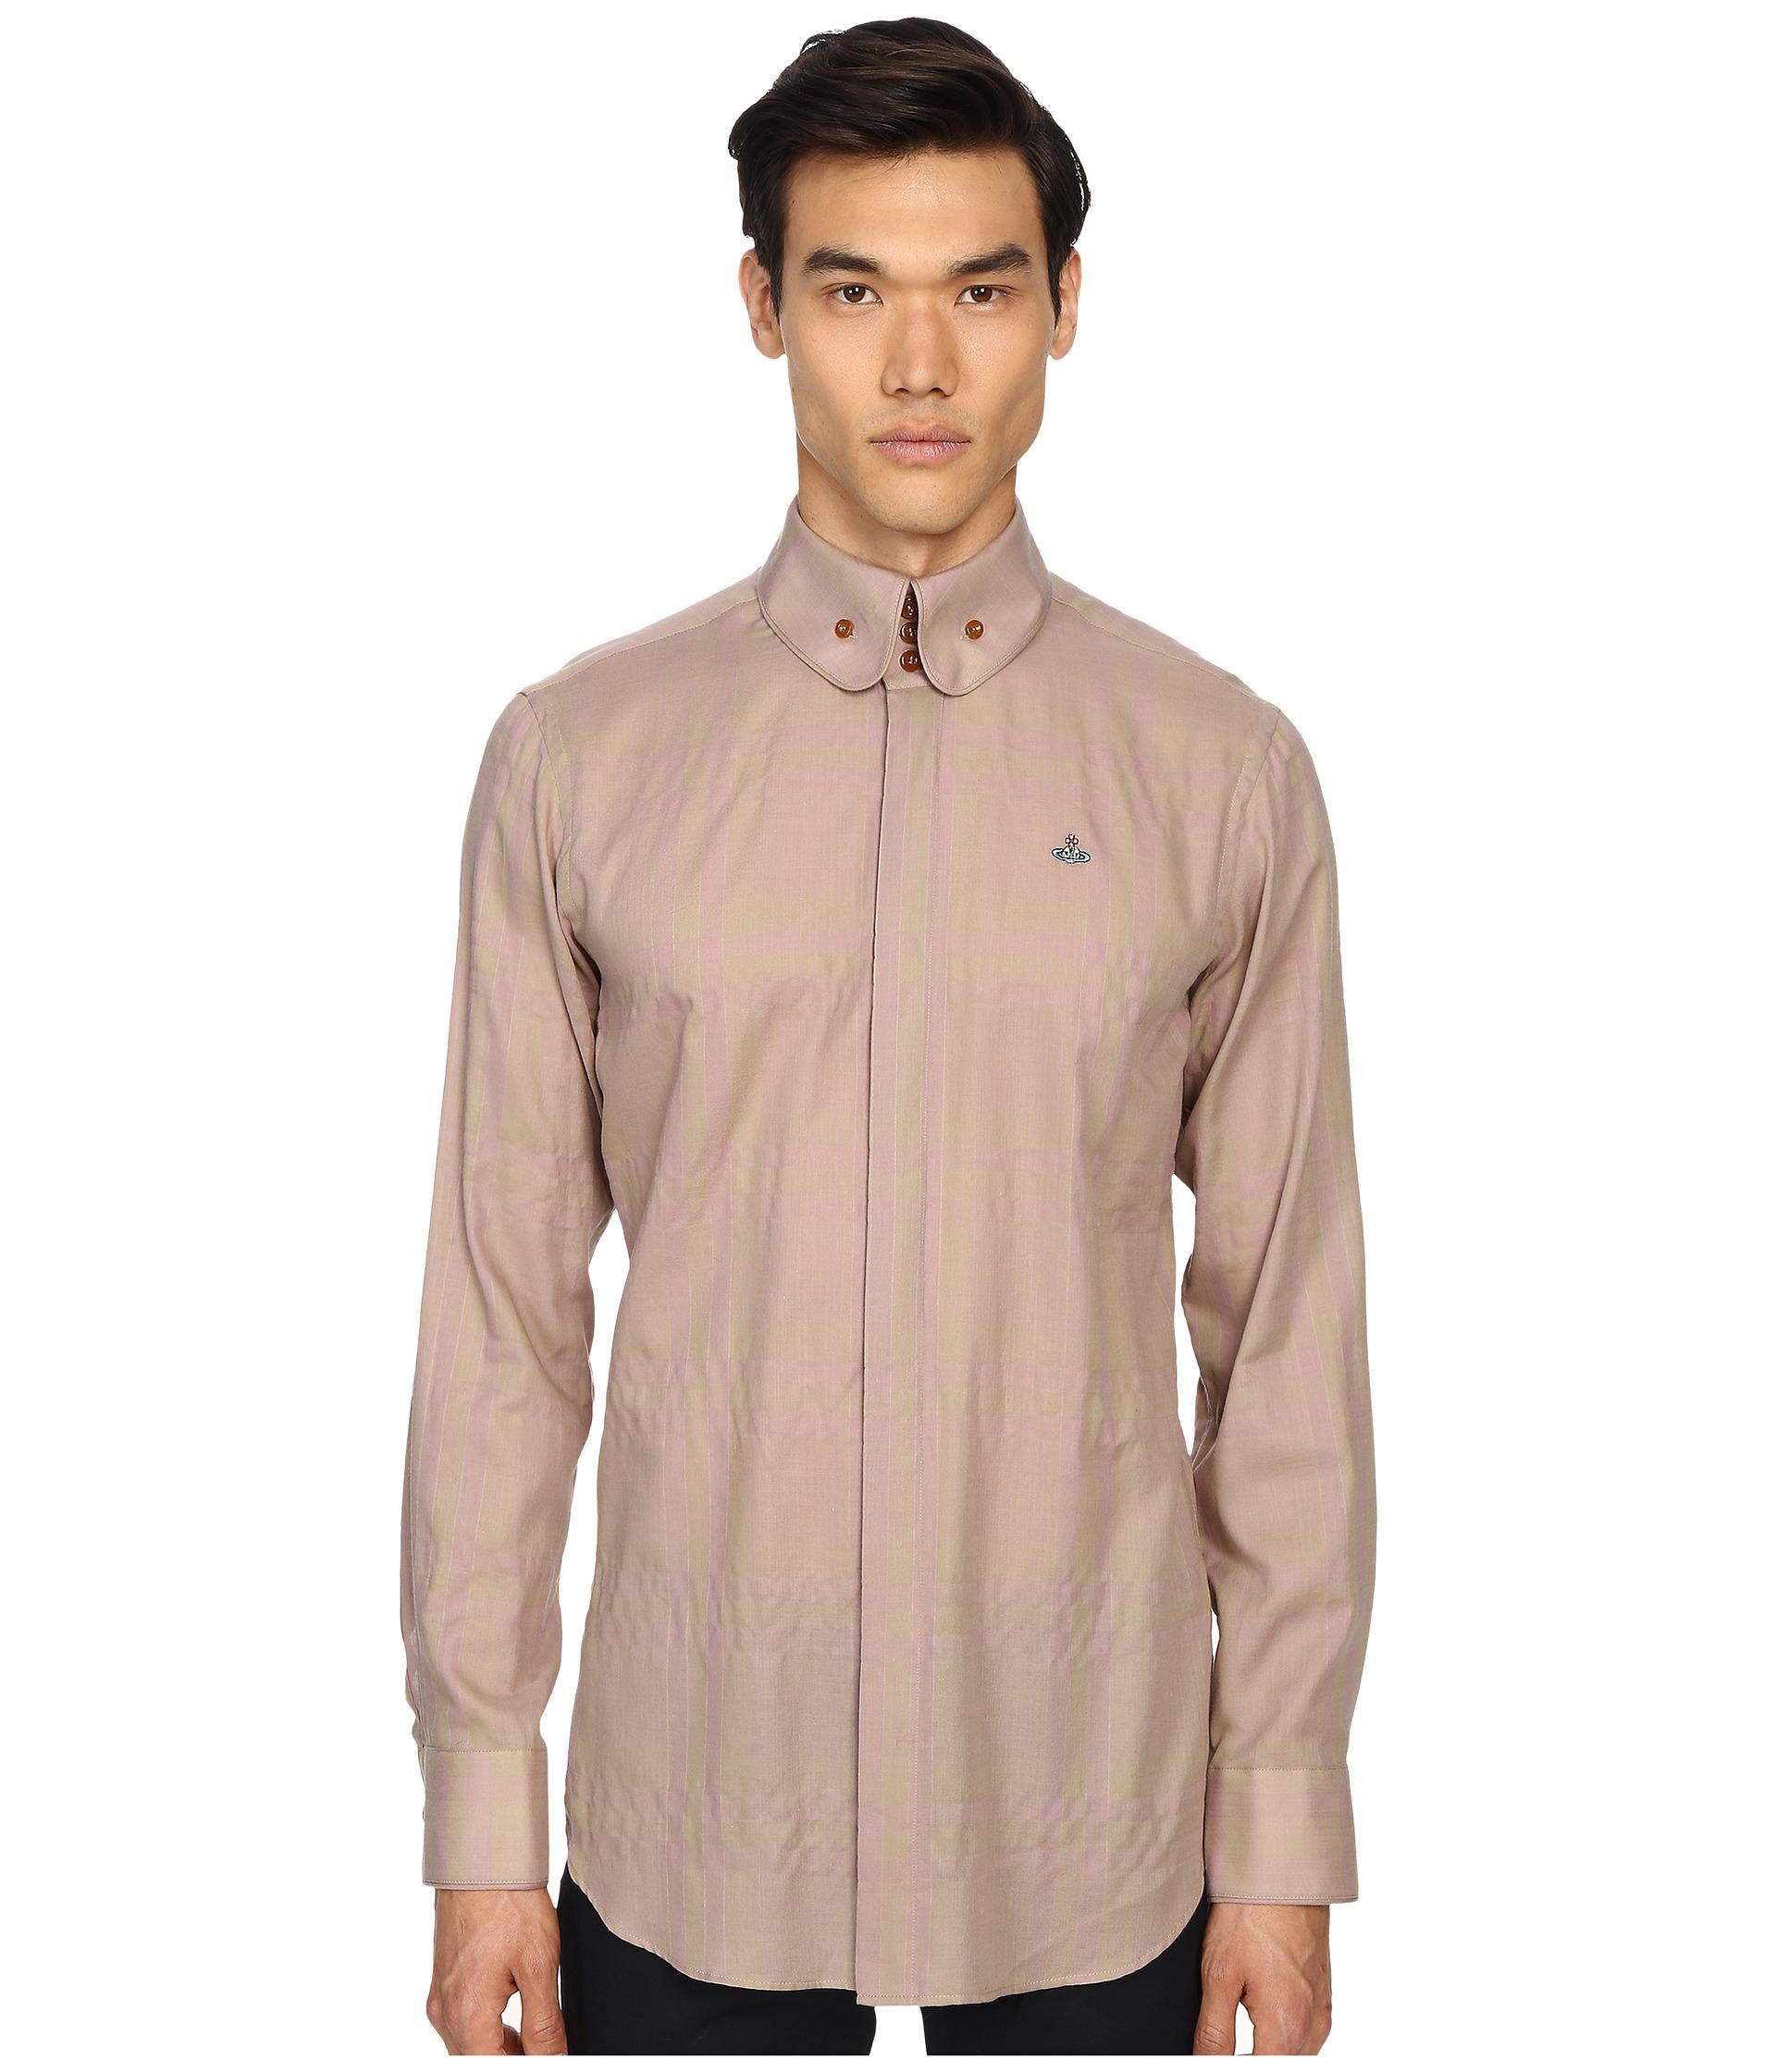 Brushed Cotton Shirts For Men Images